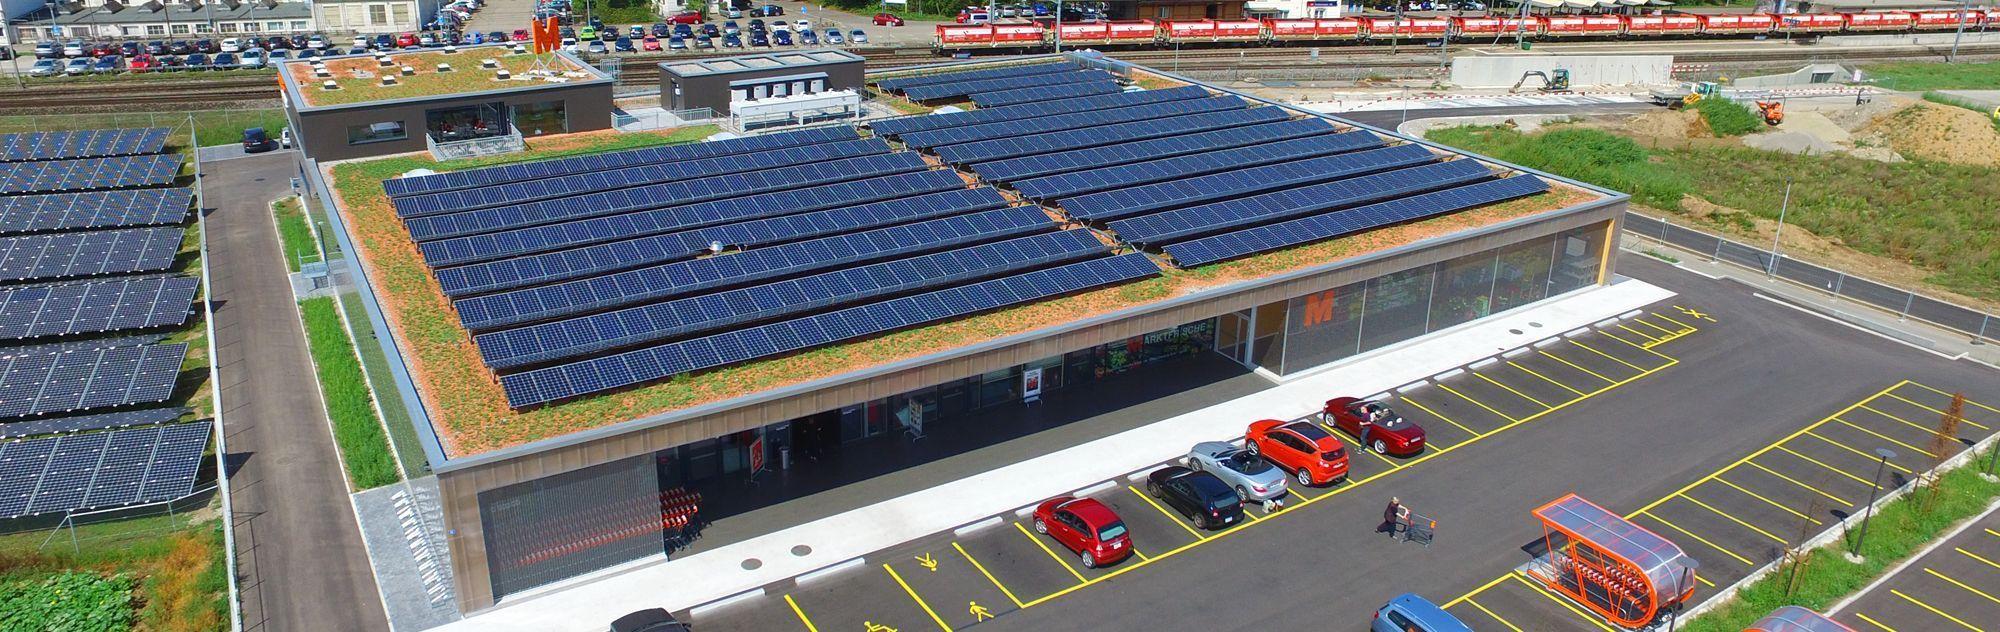 Photovoltaikanlagen Firmenkunden